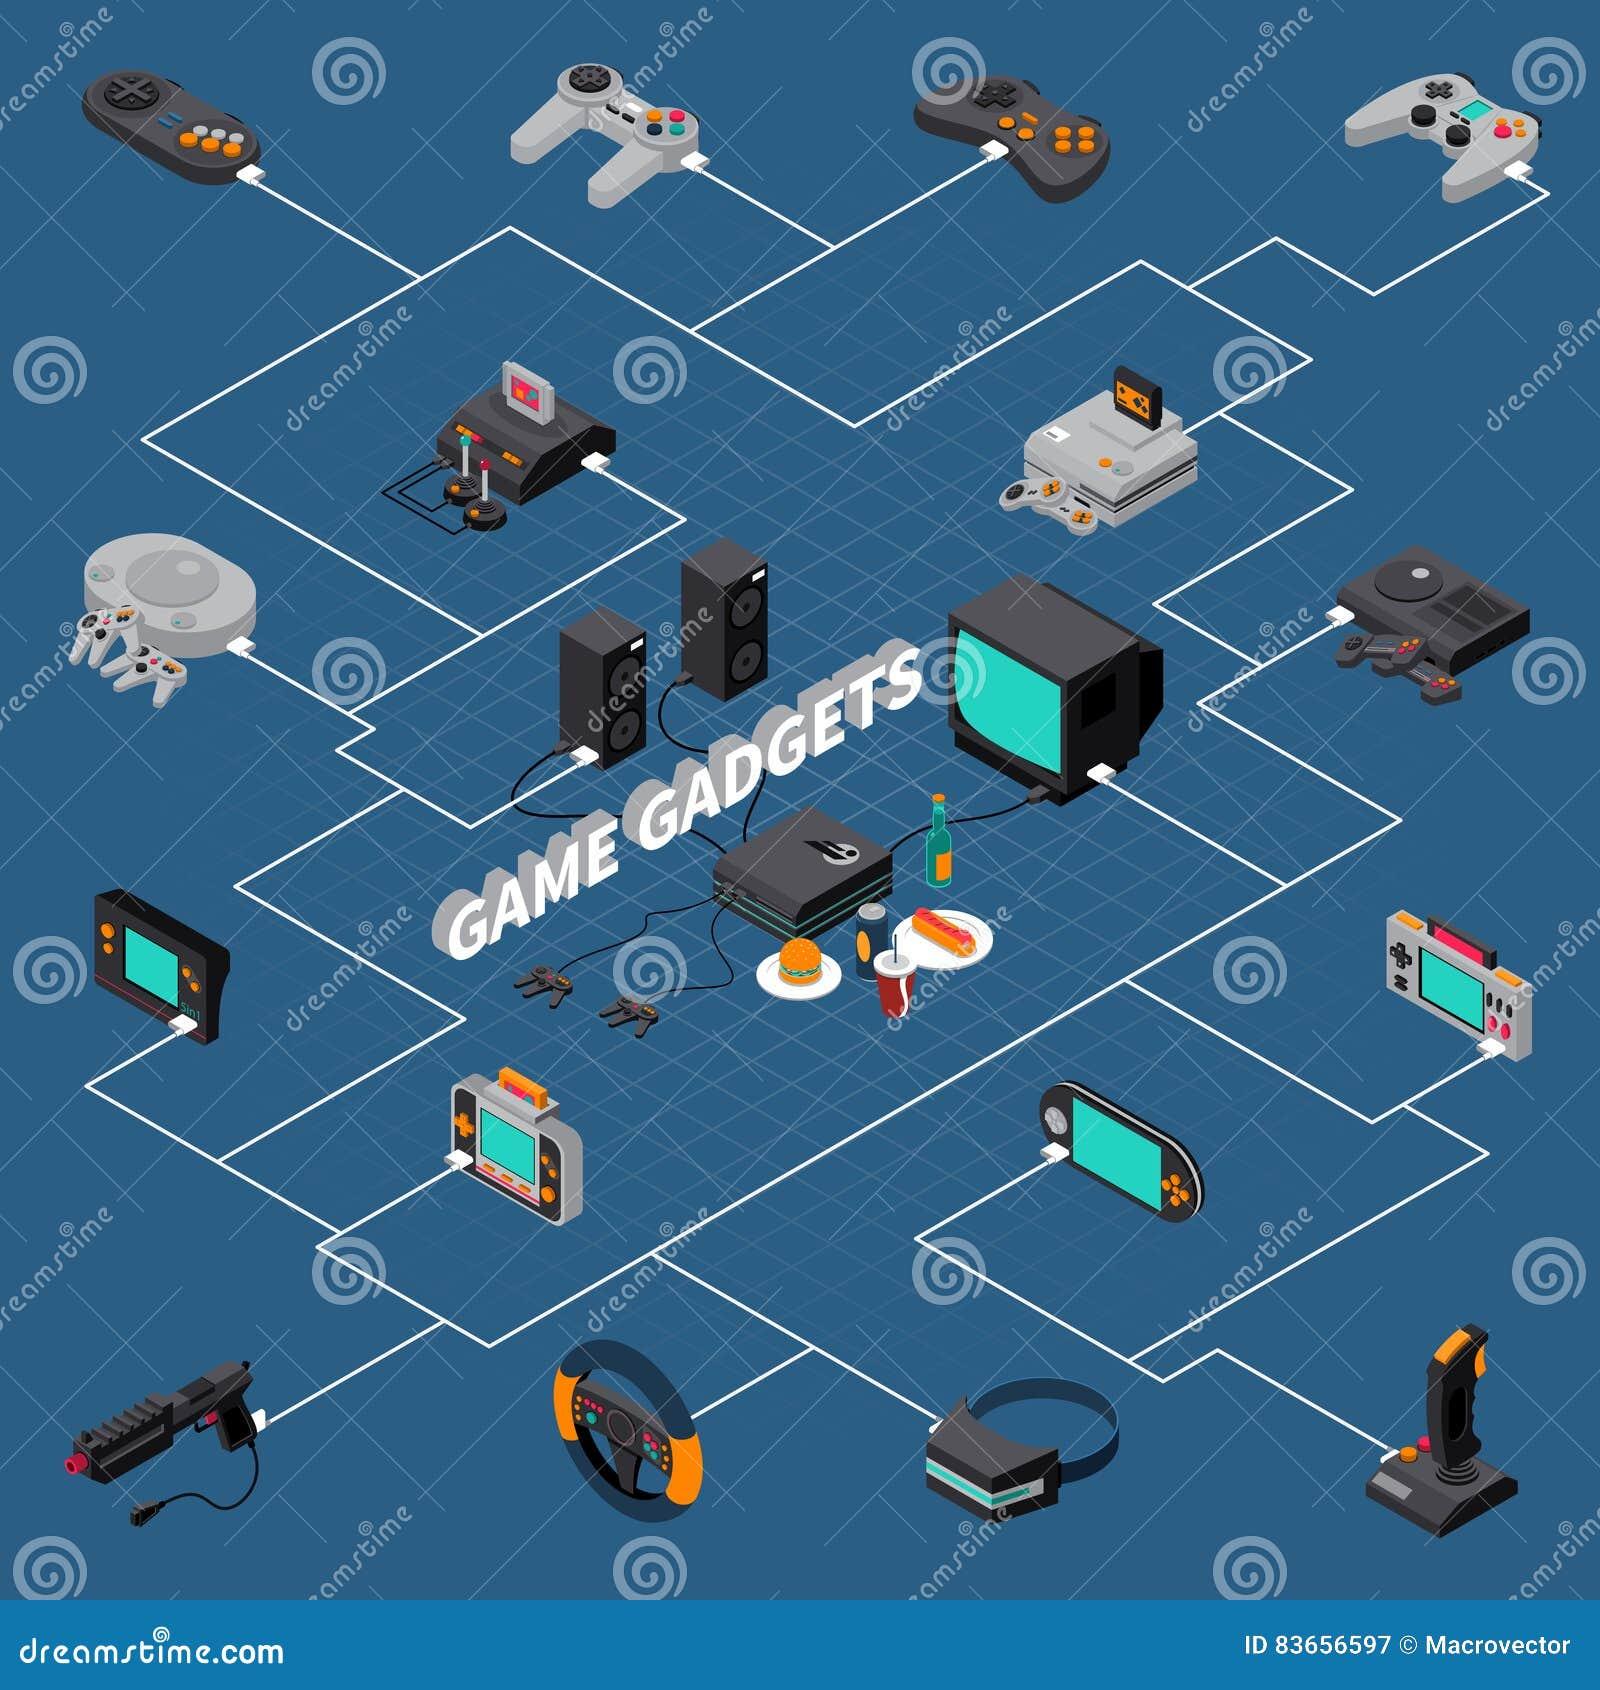 Game Gadgets Isometric Flowchart